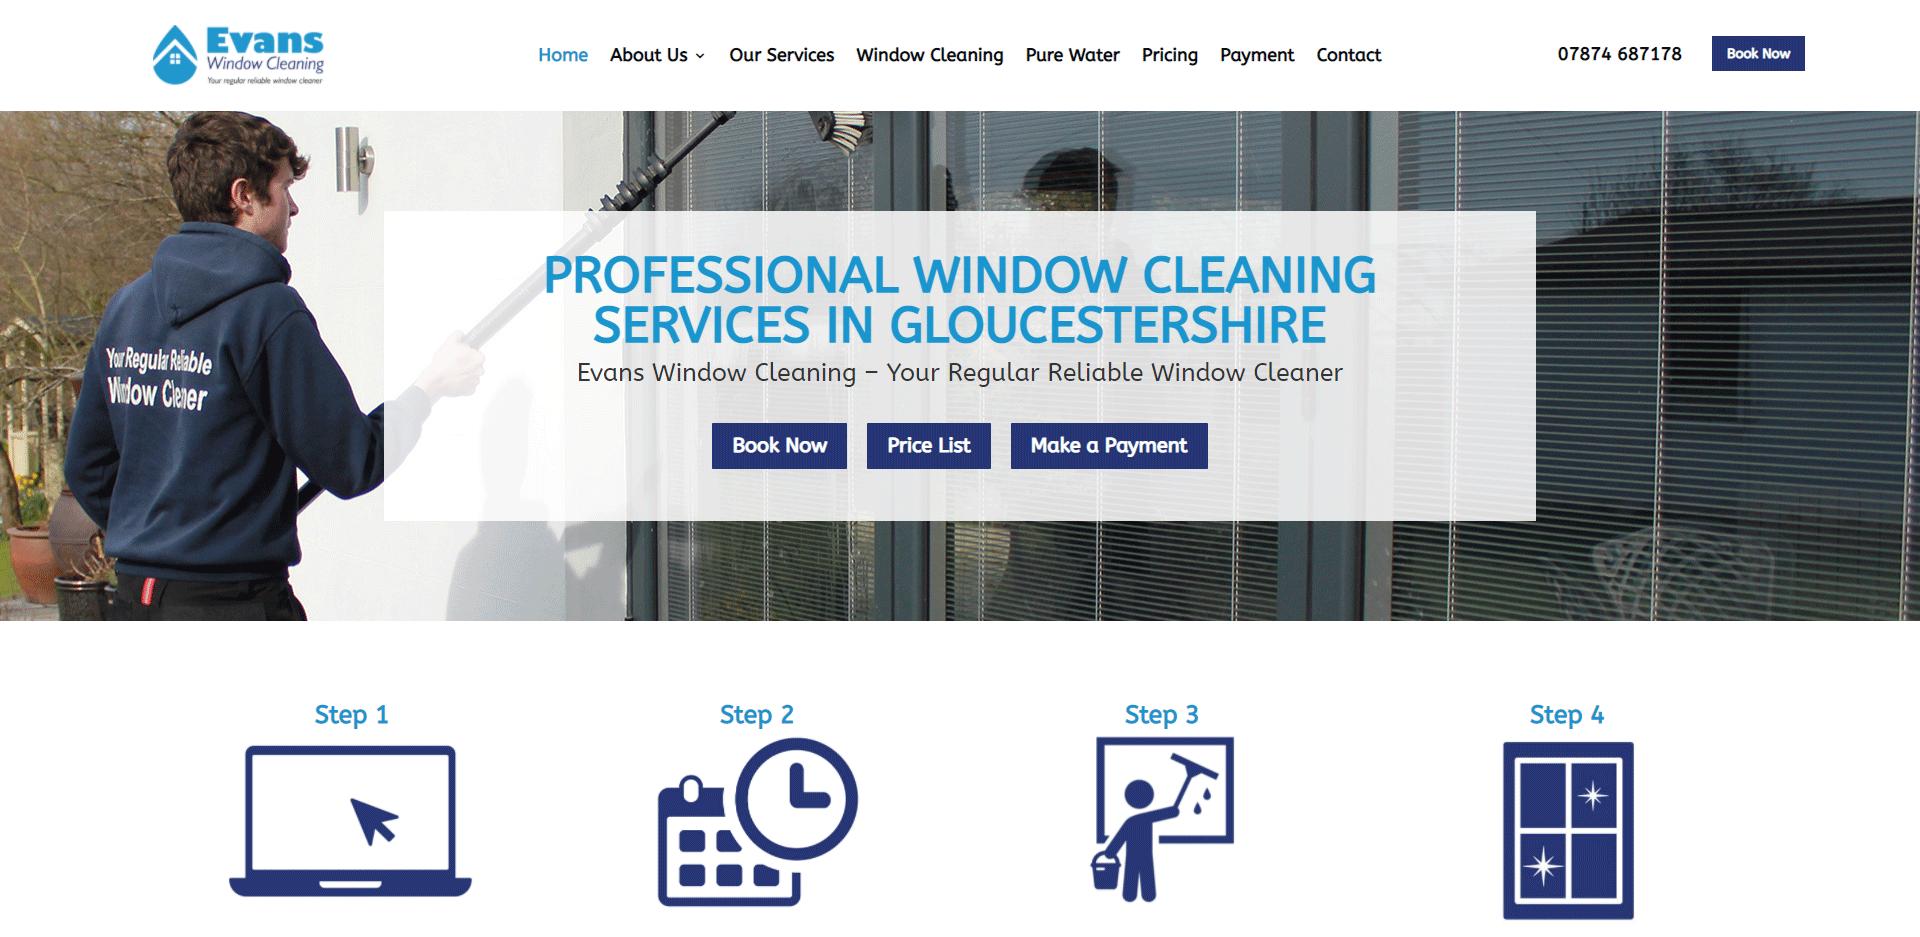 Evans Window Cleaning Screenshot